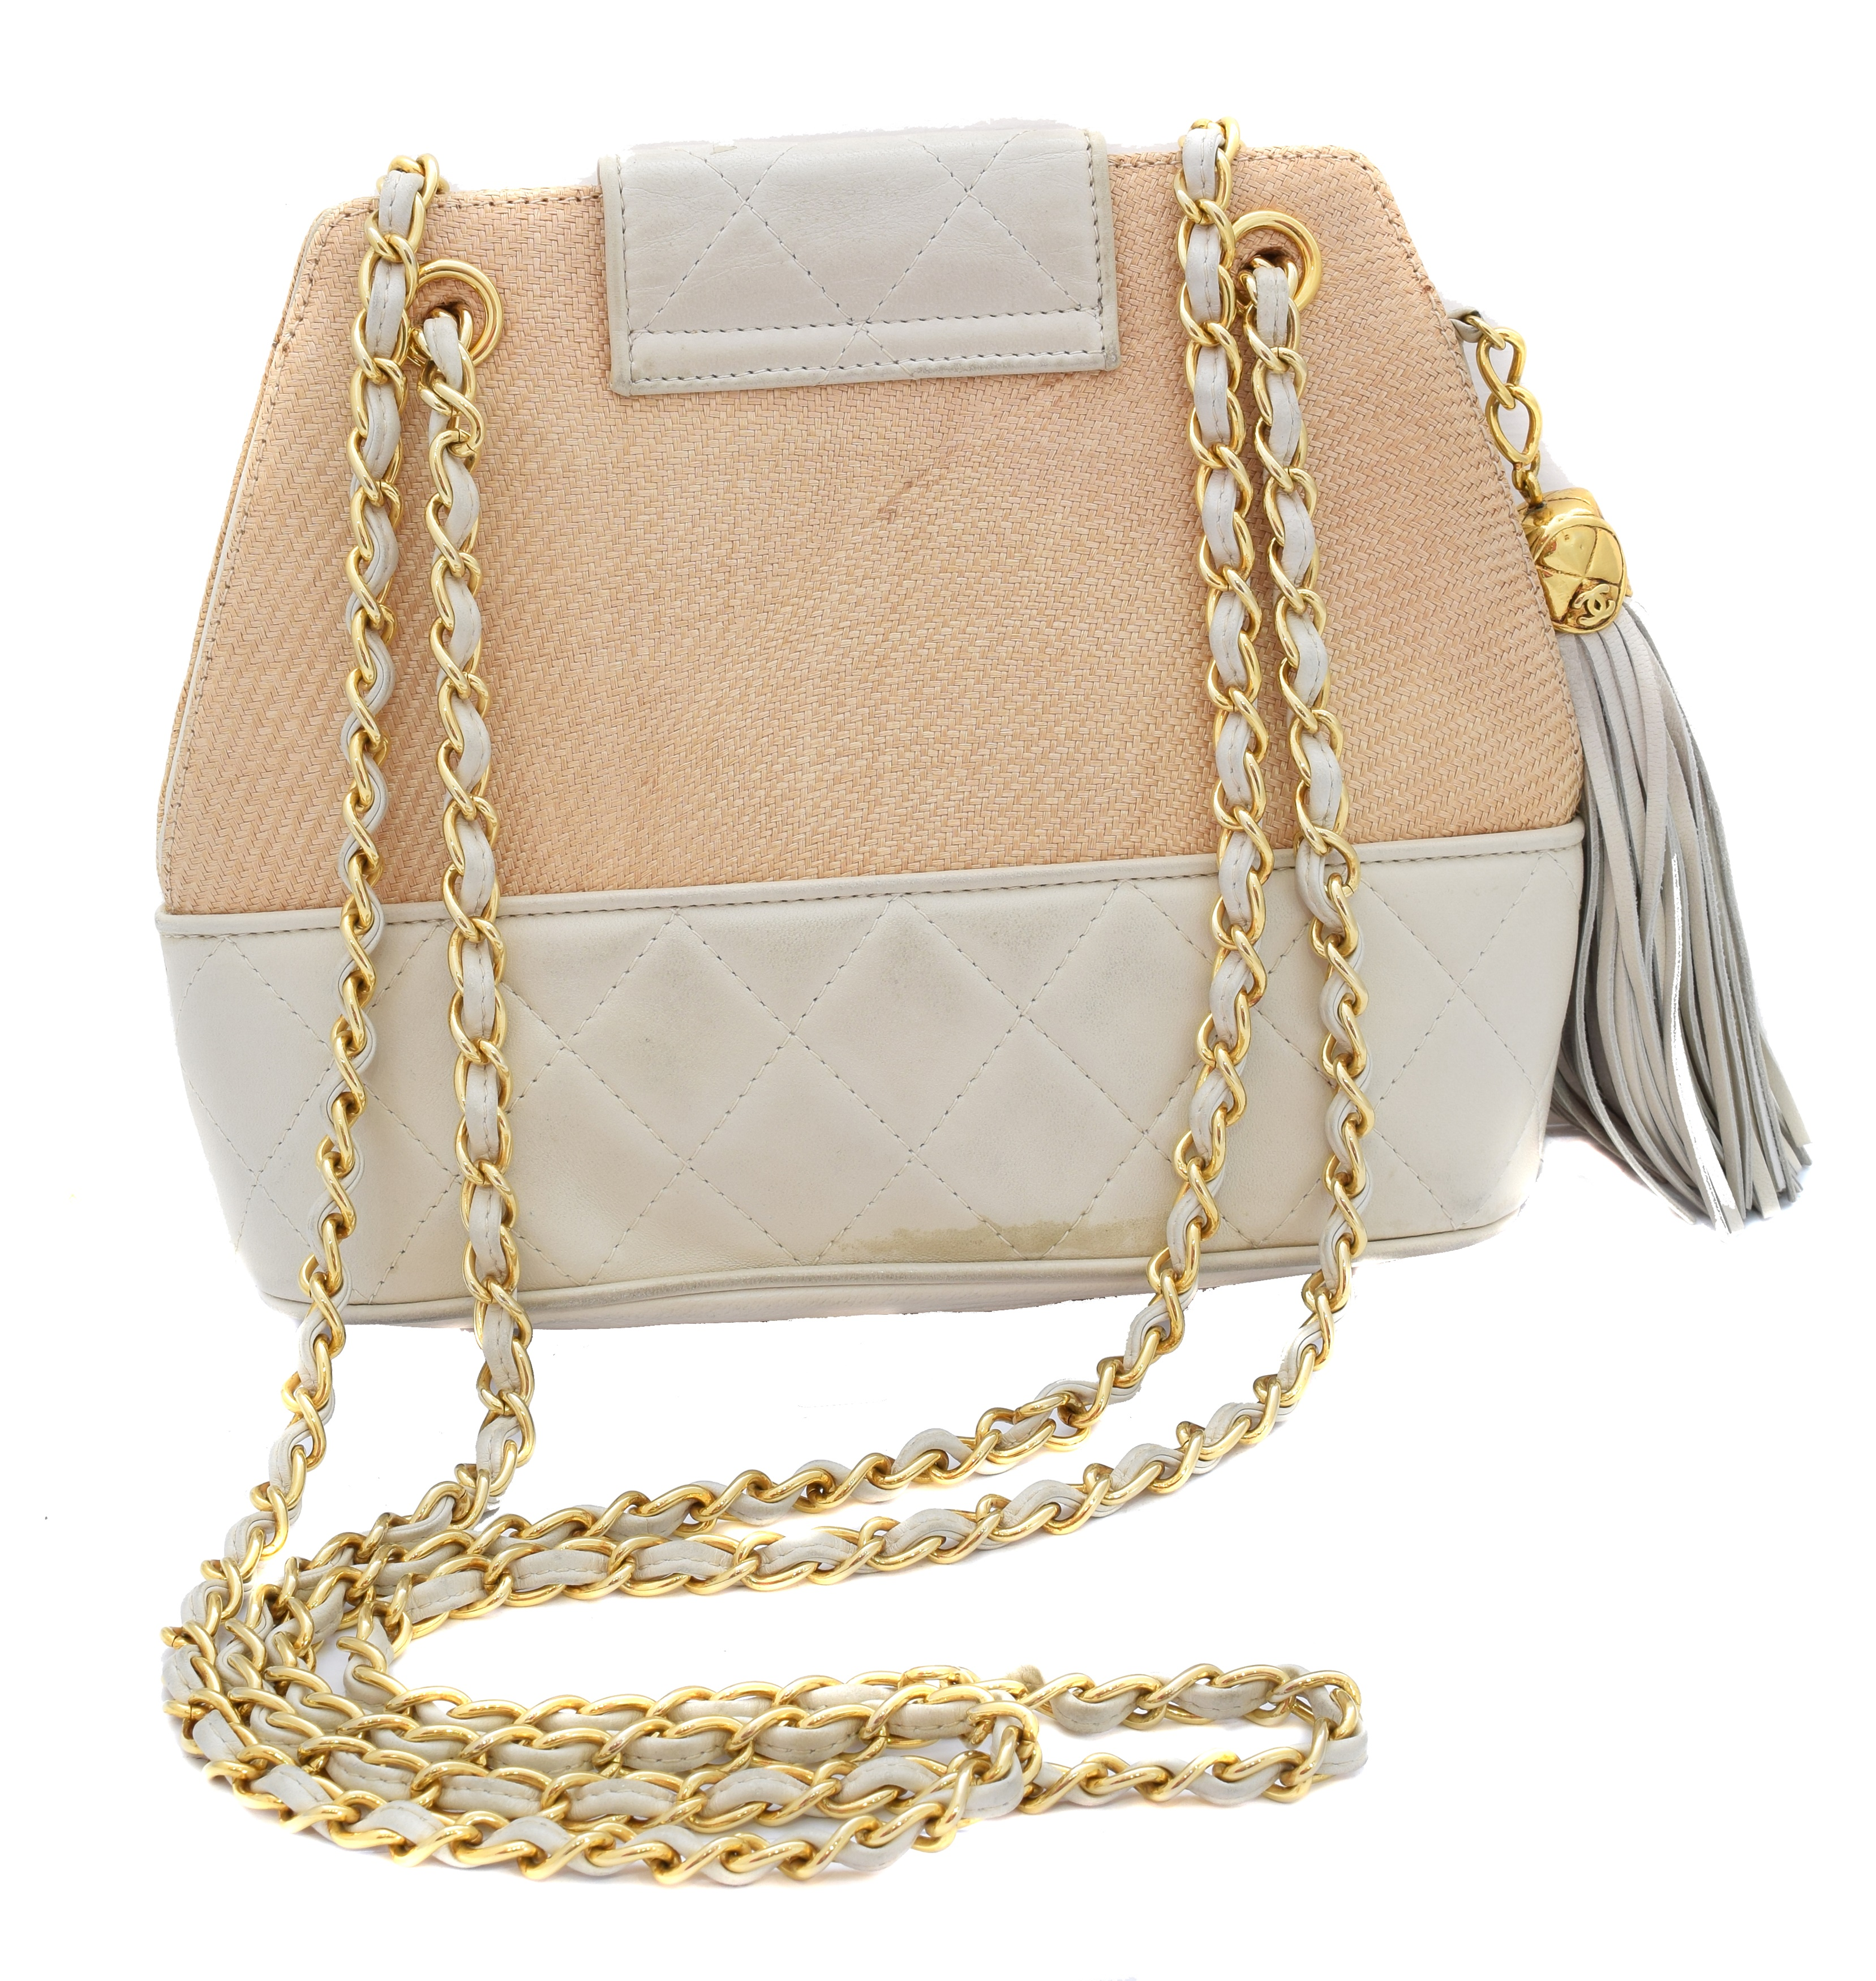 A Chanel Straw Canvas Shoulder Bag, - Image 2 of 2